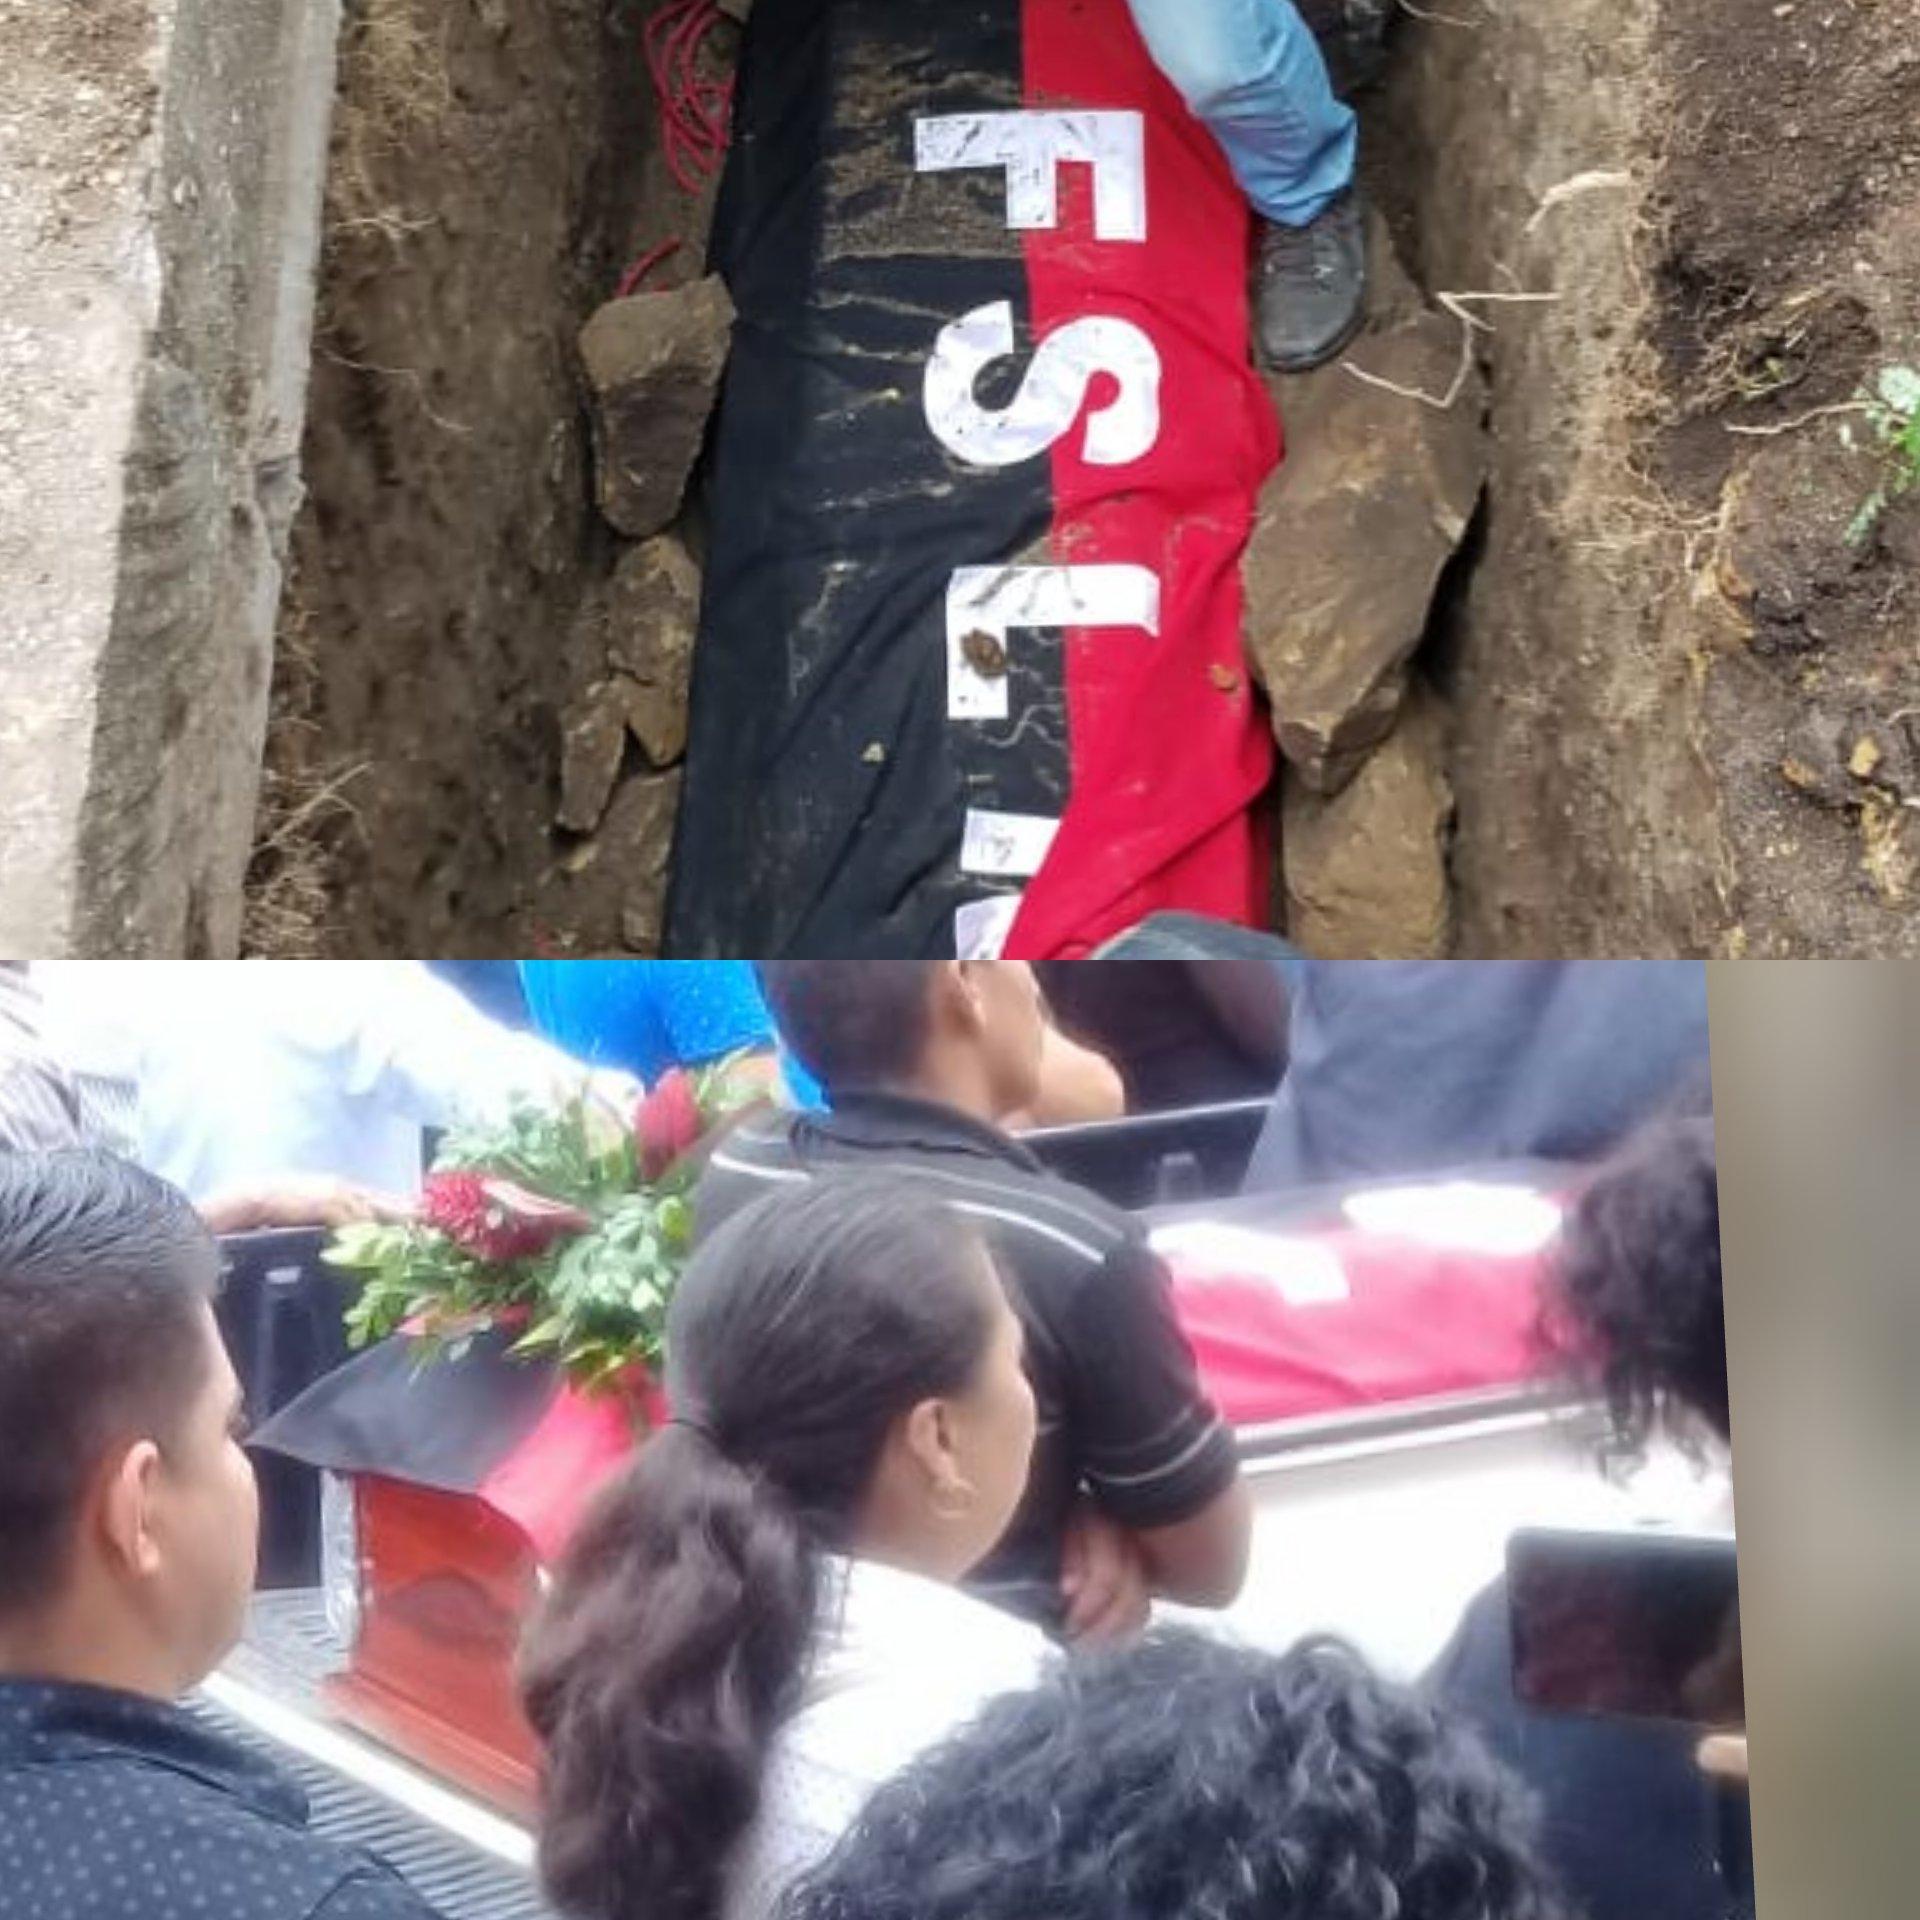 Cepelio del militante sandinista Luis Alberto Espinoza Ruiz